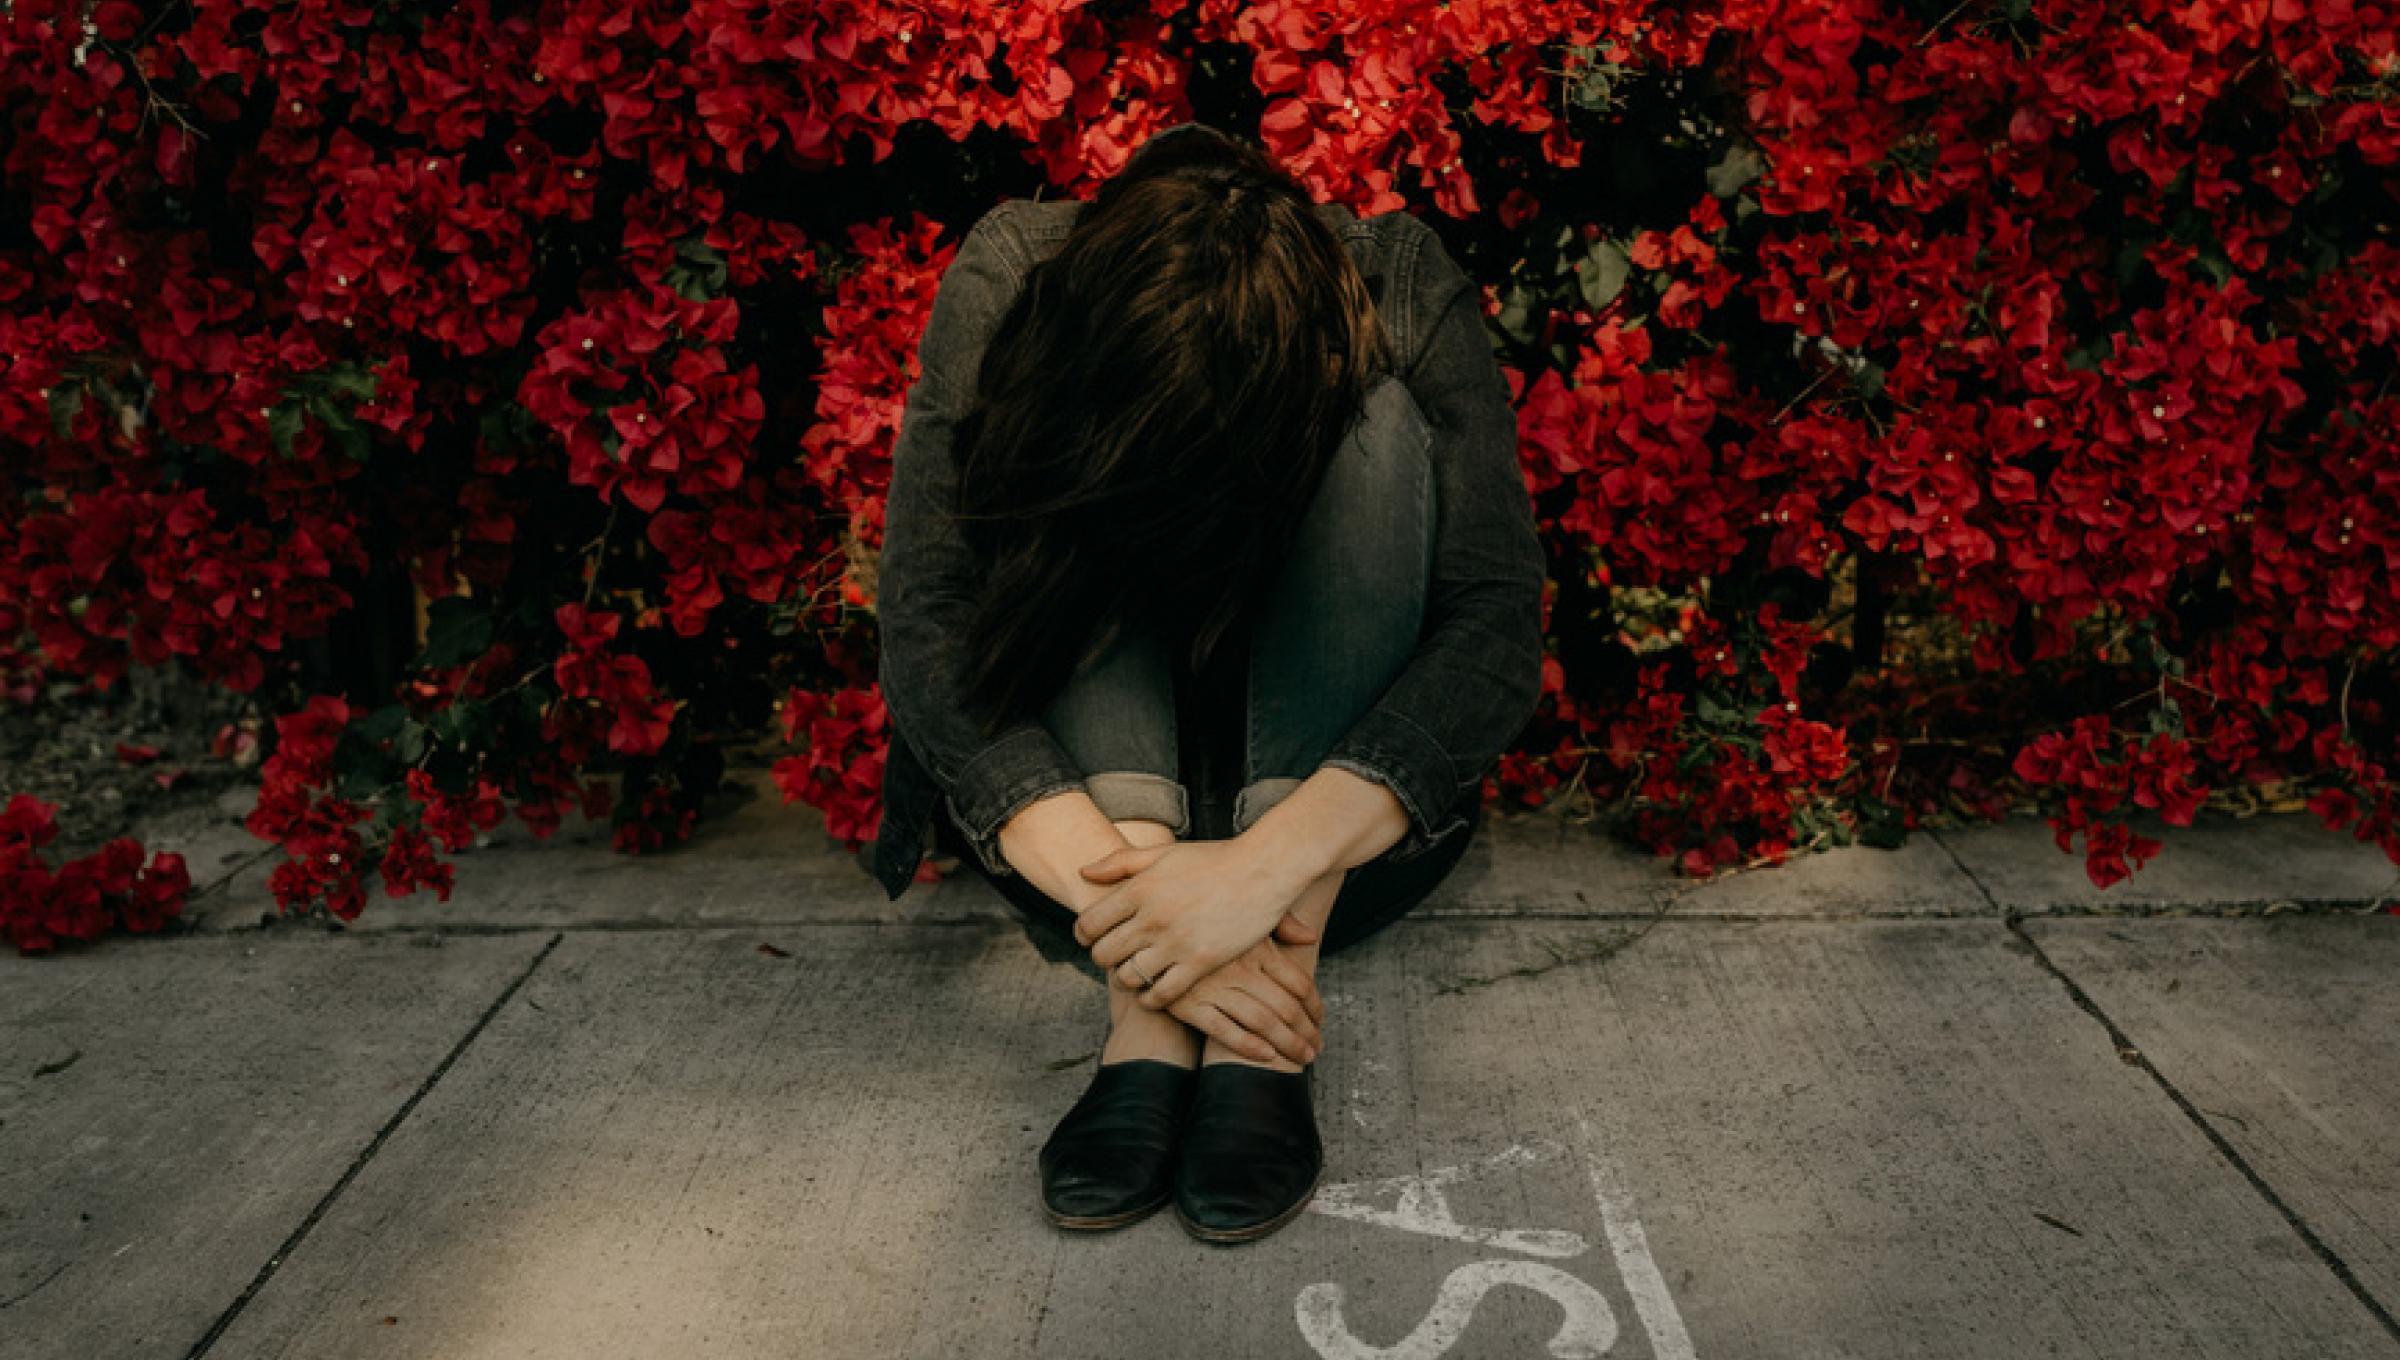 Is Premenstrual Dysphoric Disorder Making You Miserable